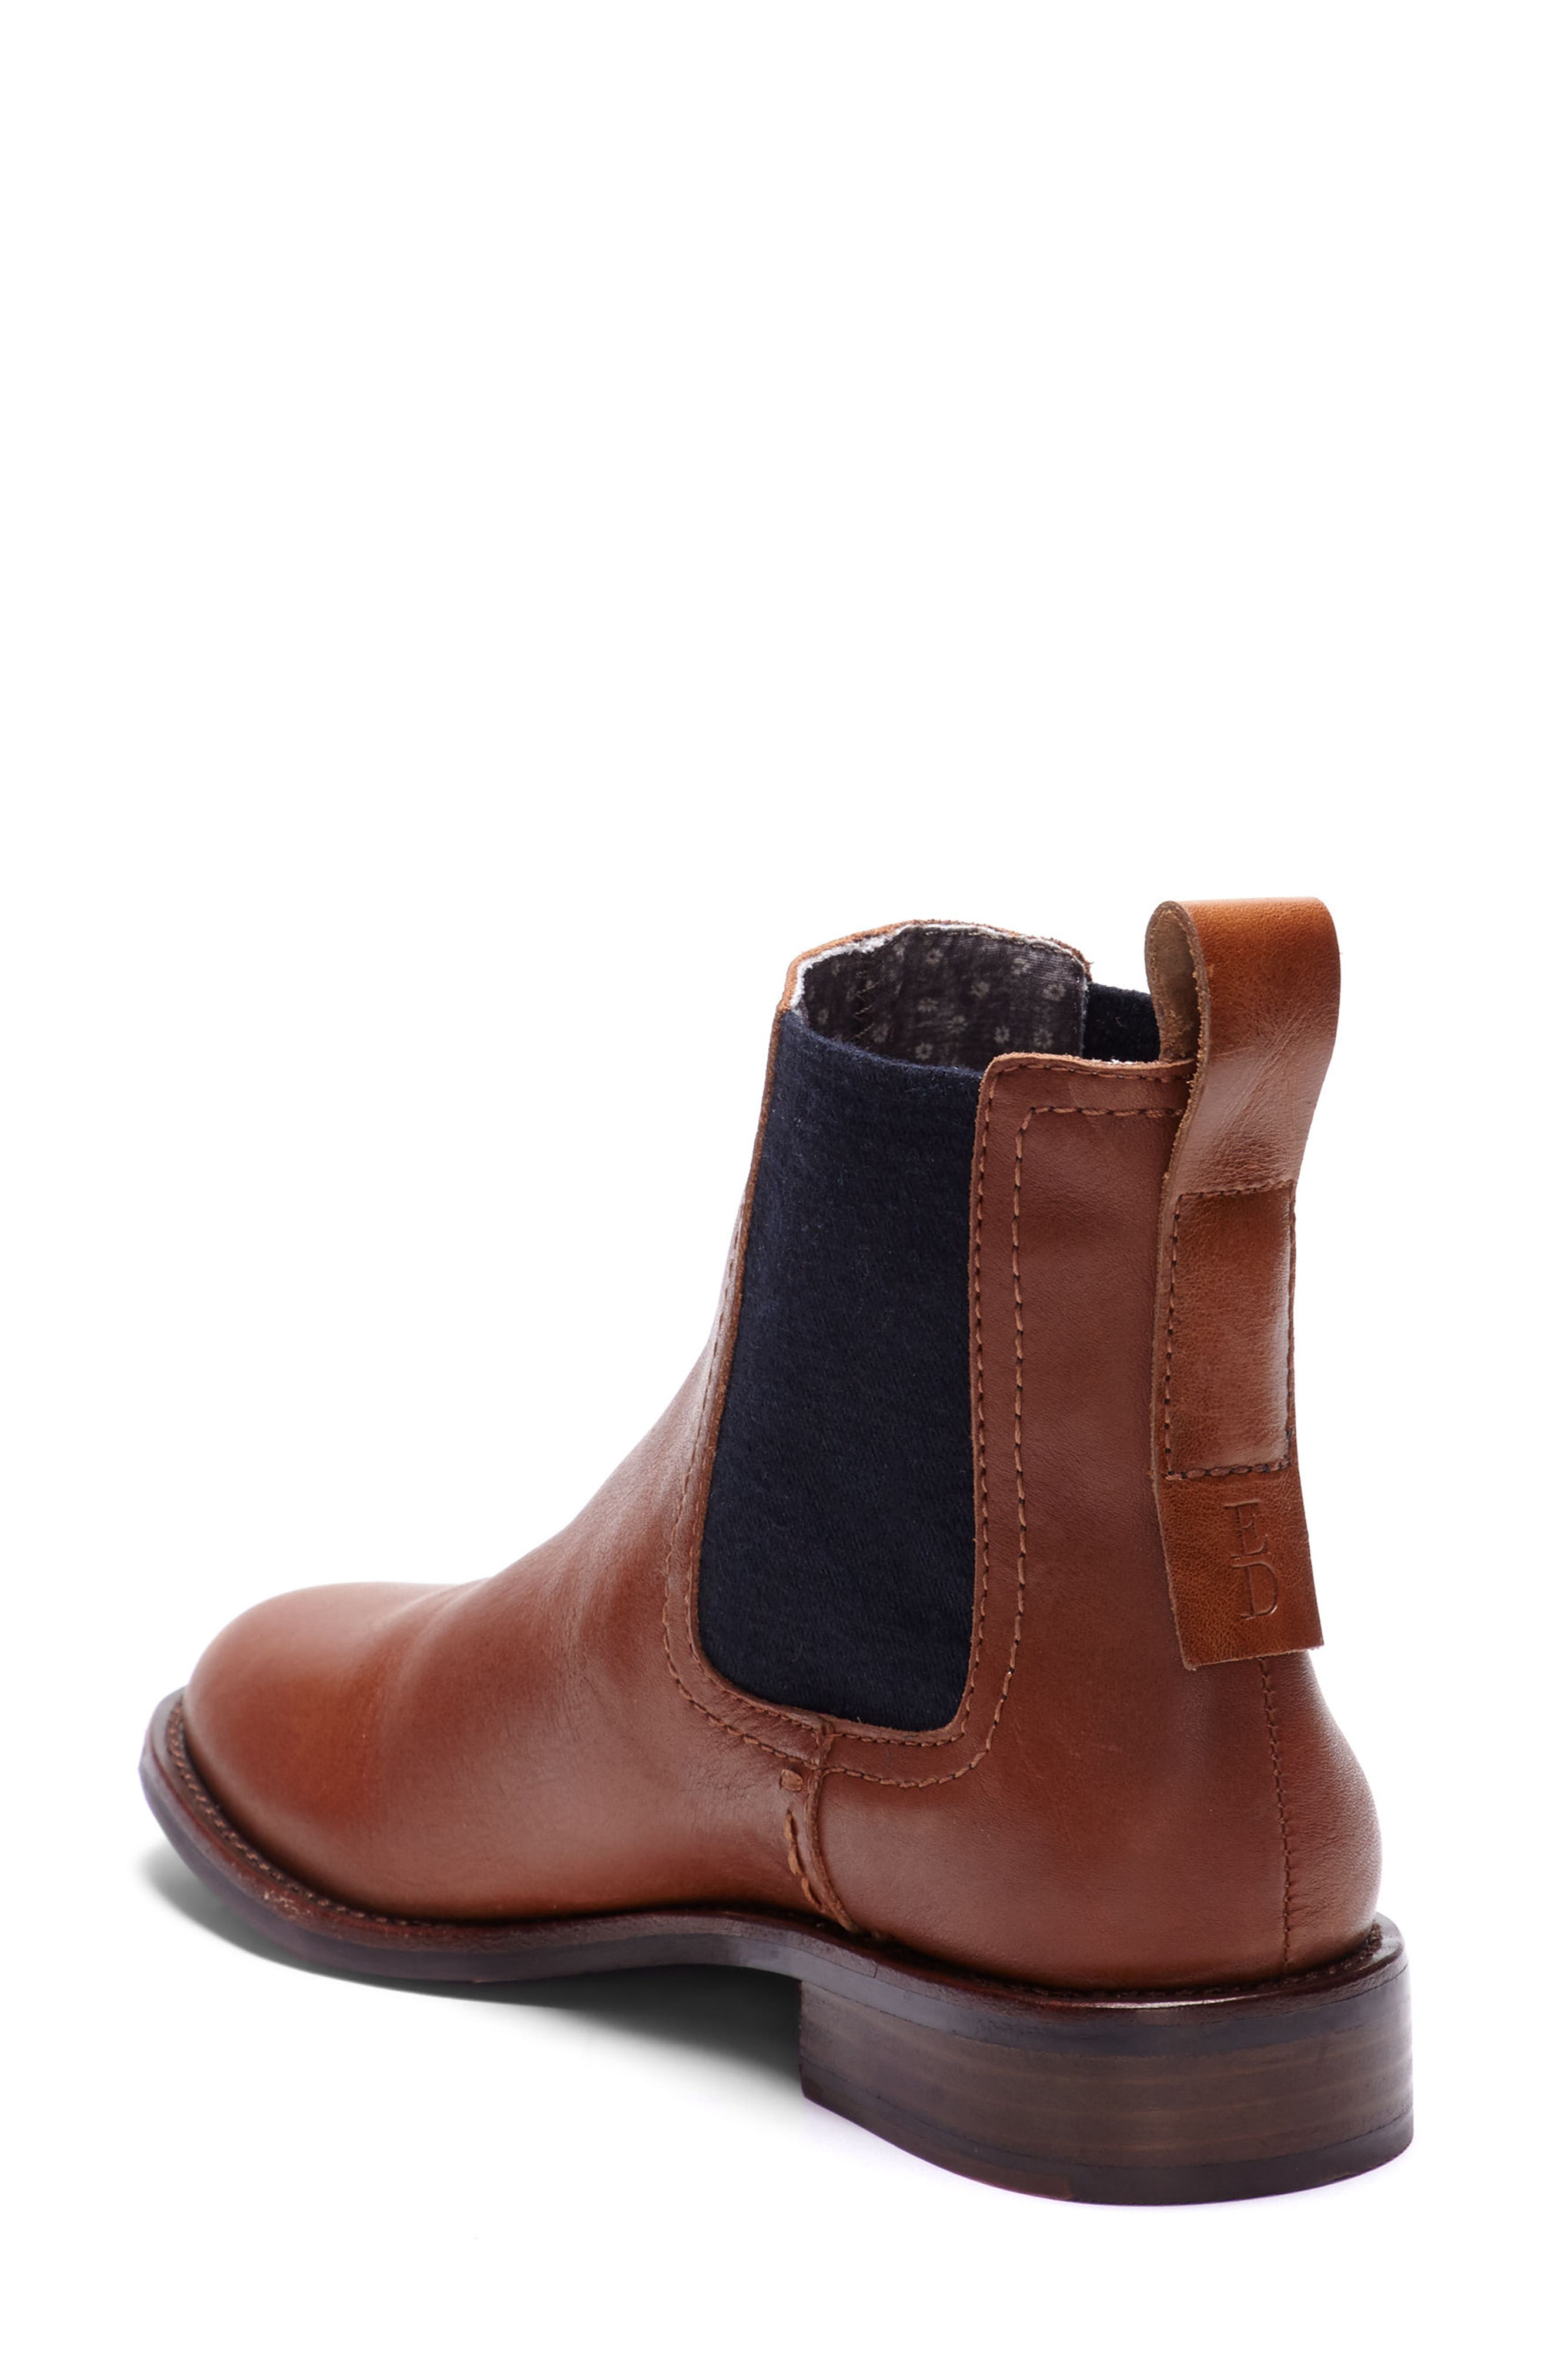 Zabi Chelsea Boot,                             Alternate thumbnail 2, color,                             Yam Leather